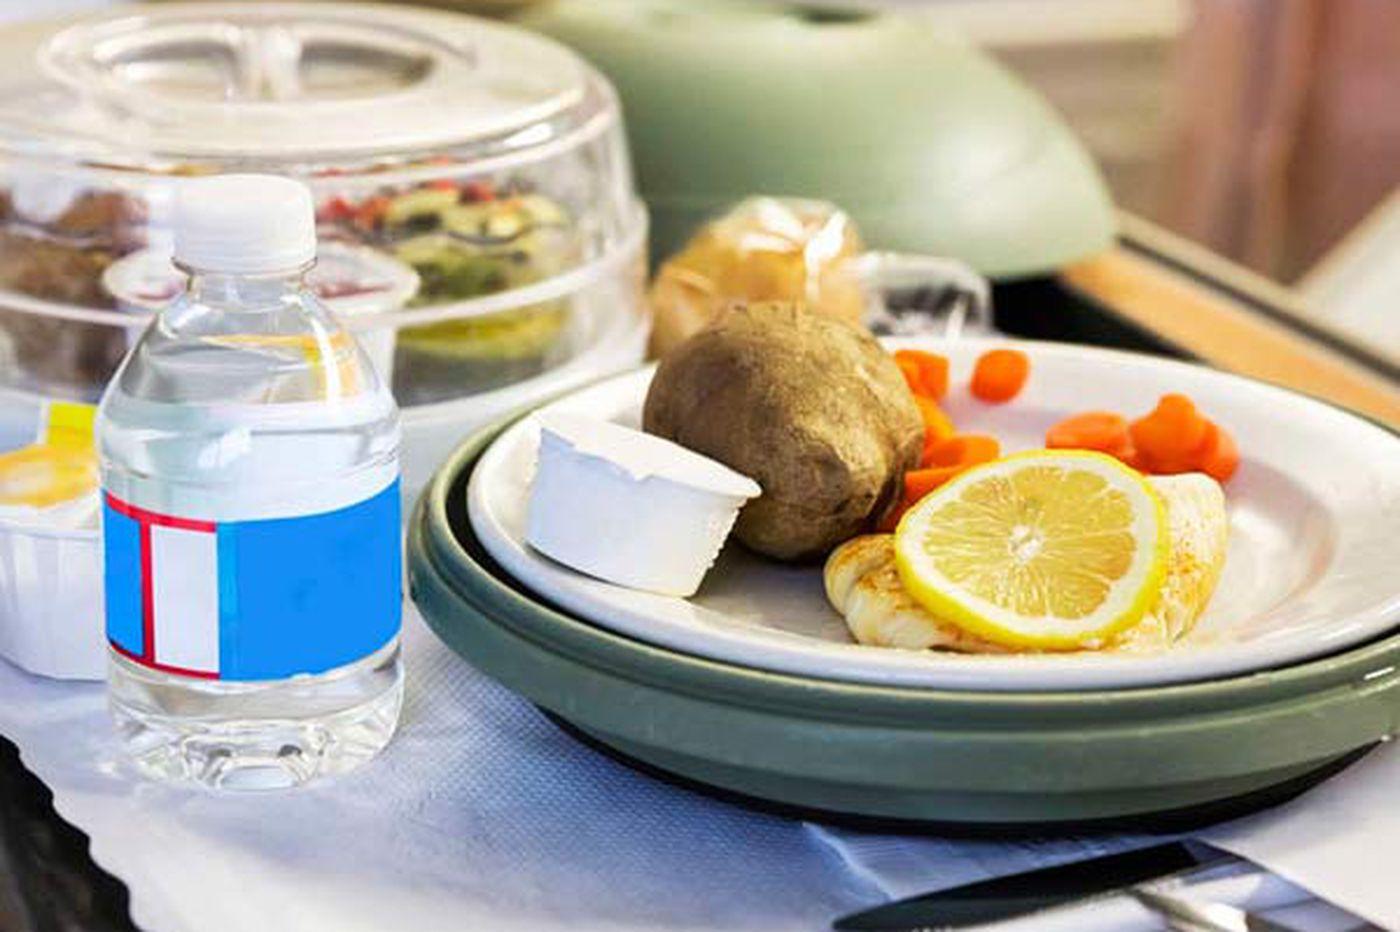 No joke: Hospital patients endangered by food, report finds